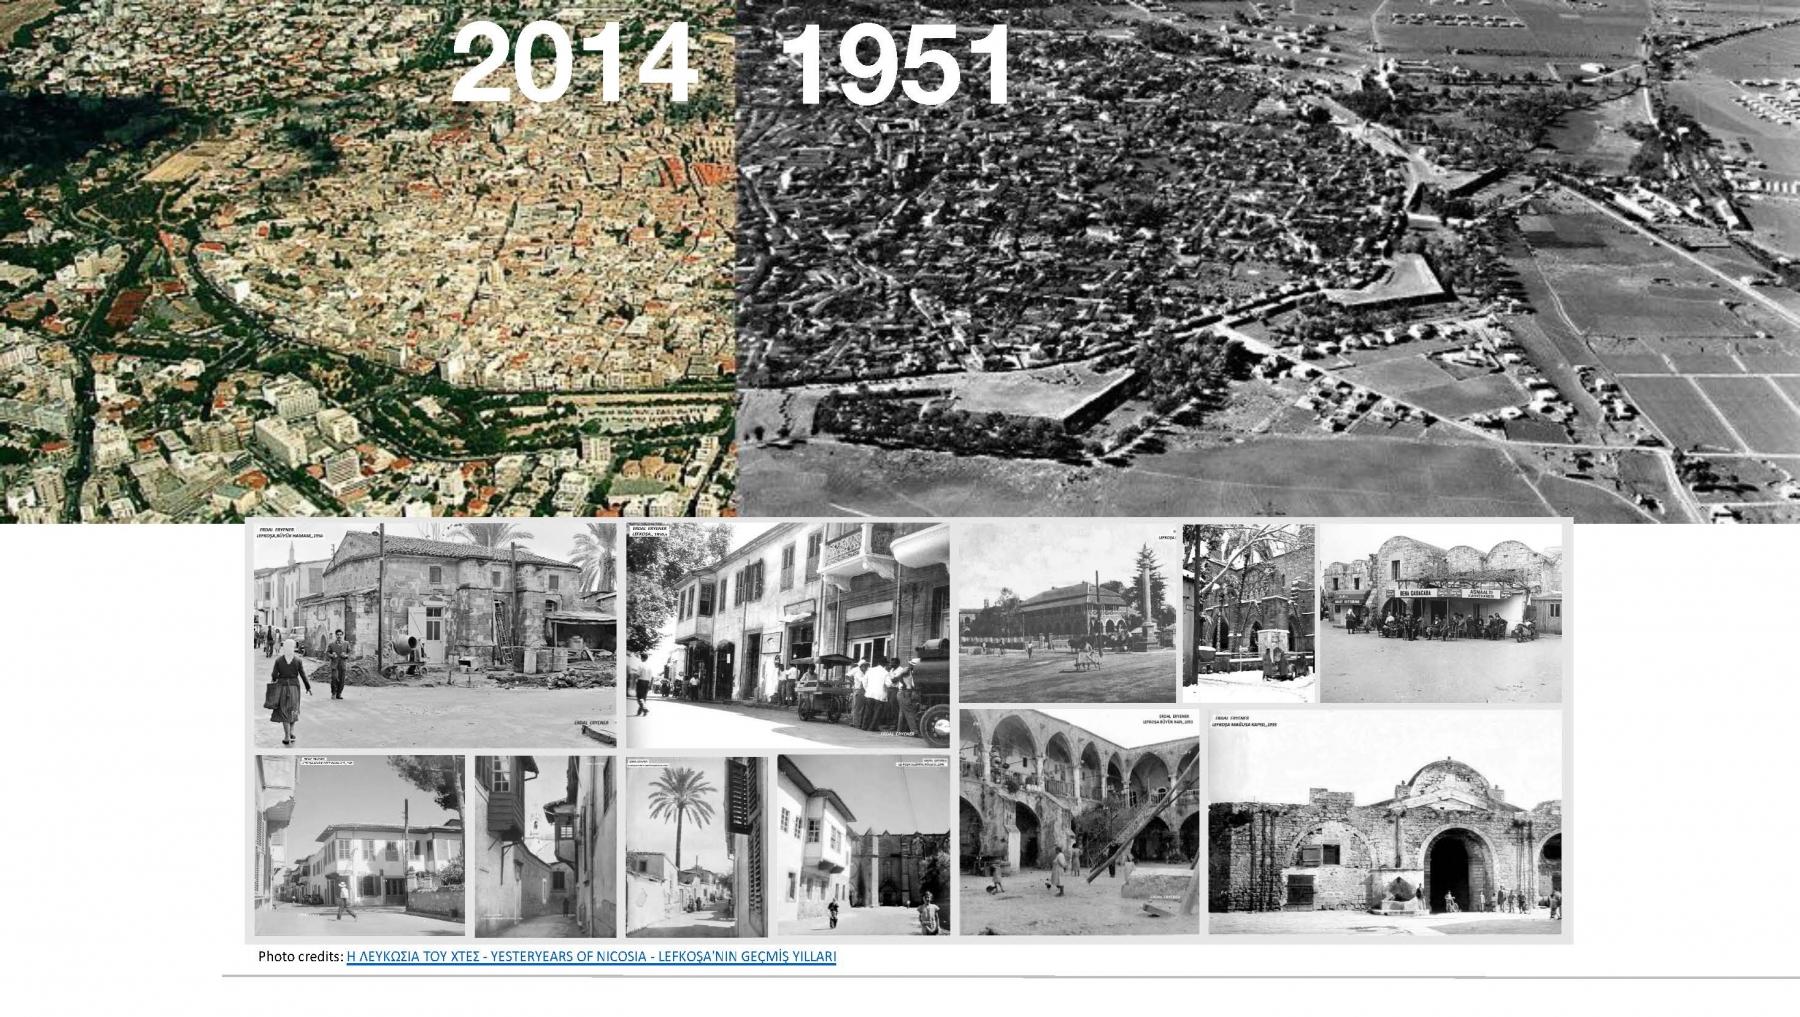 Nicosia Time Machine project (pres. by George Artopoulos)